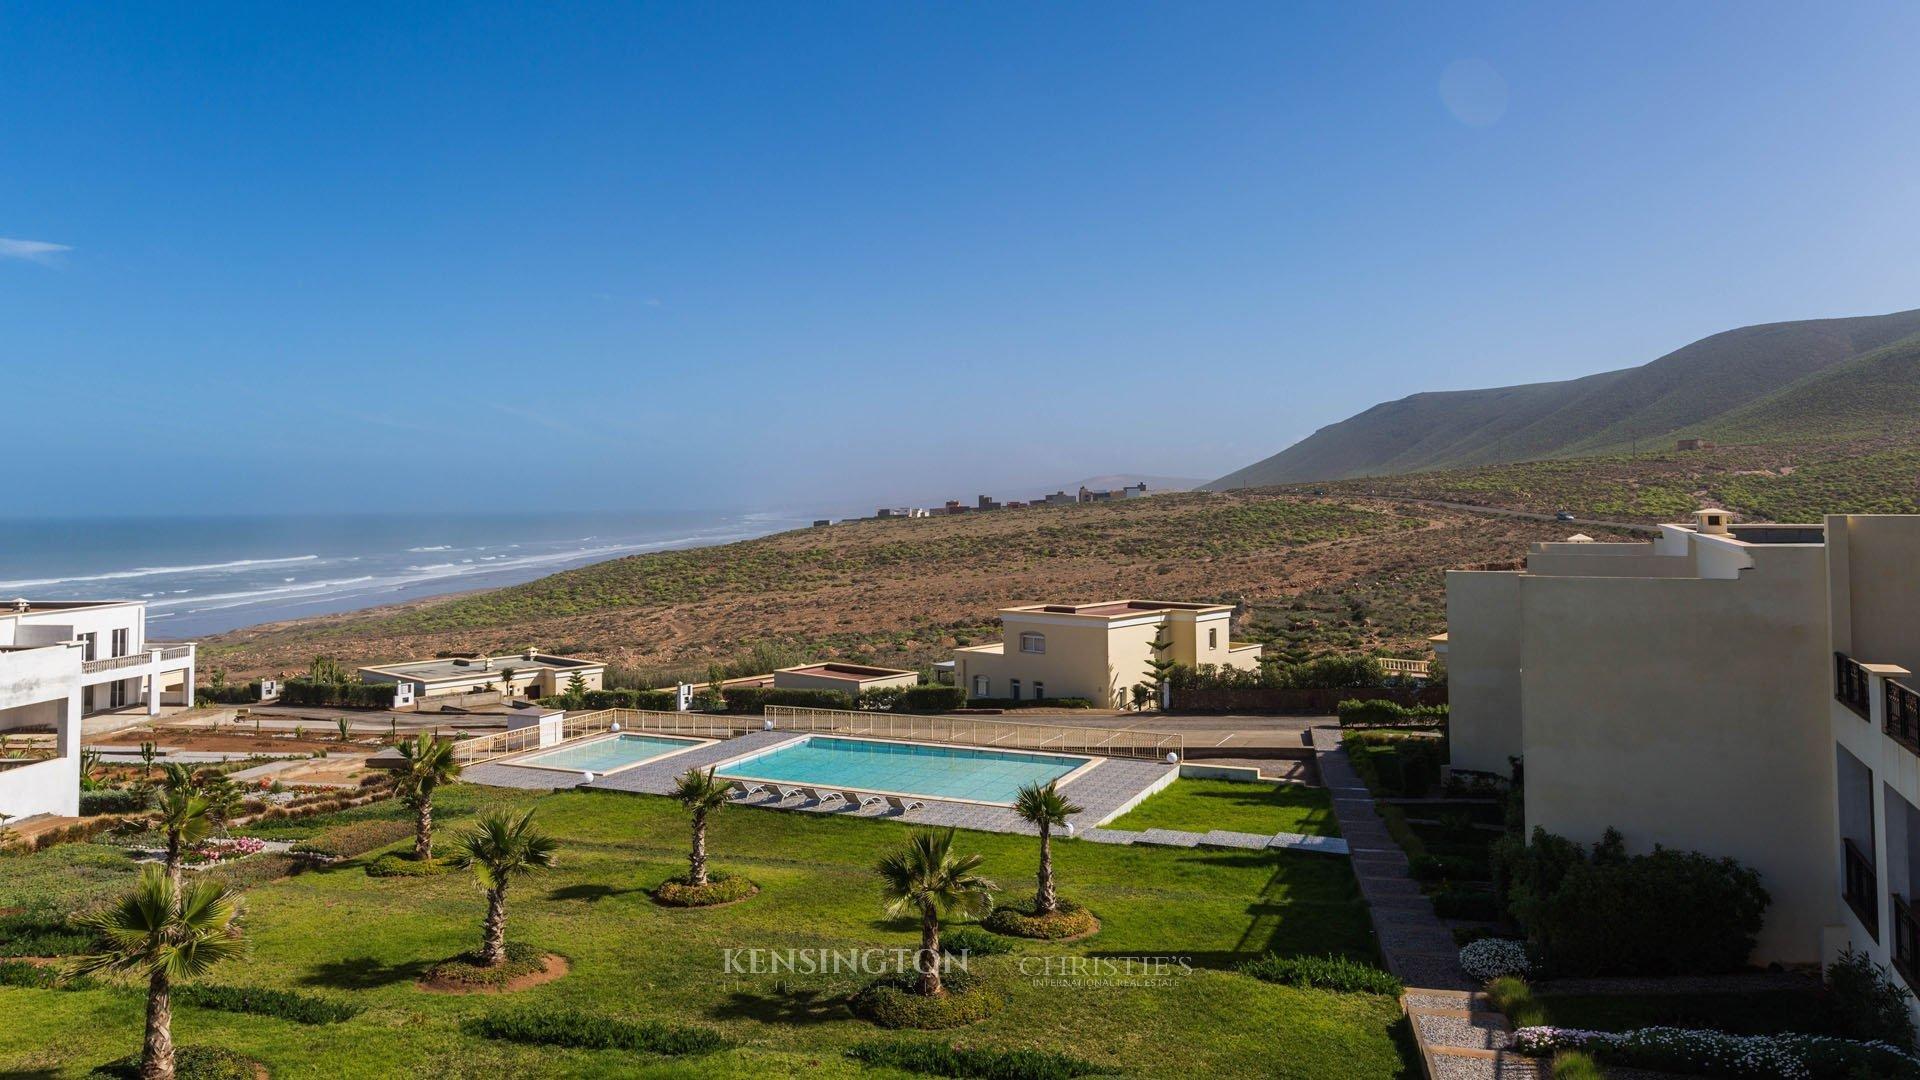 KPPM00955: Aisha Apartment Apartment Agadir Morocco